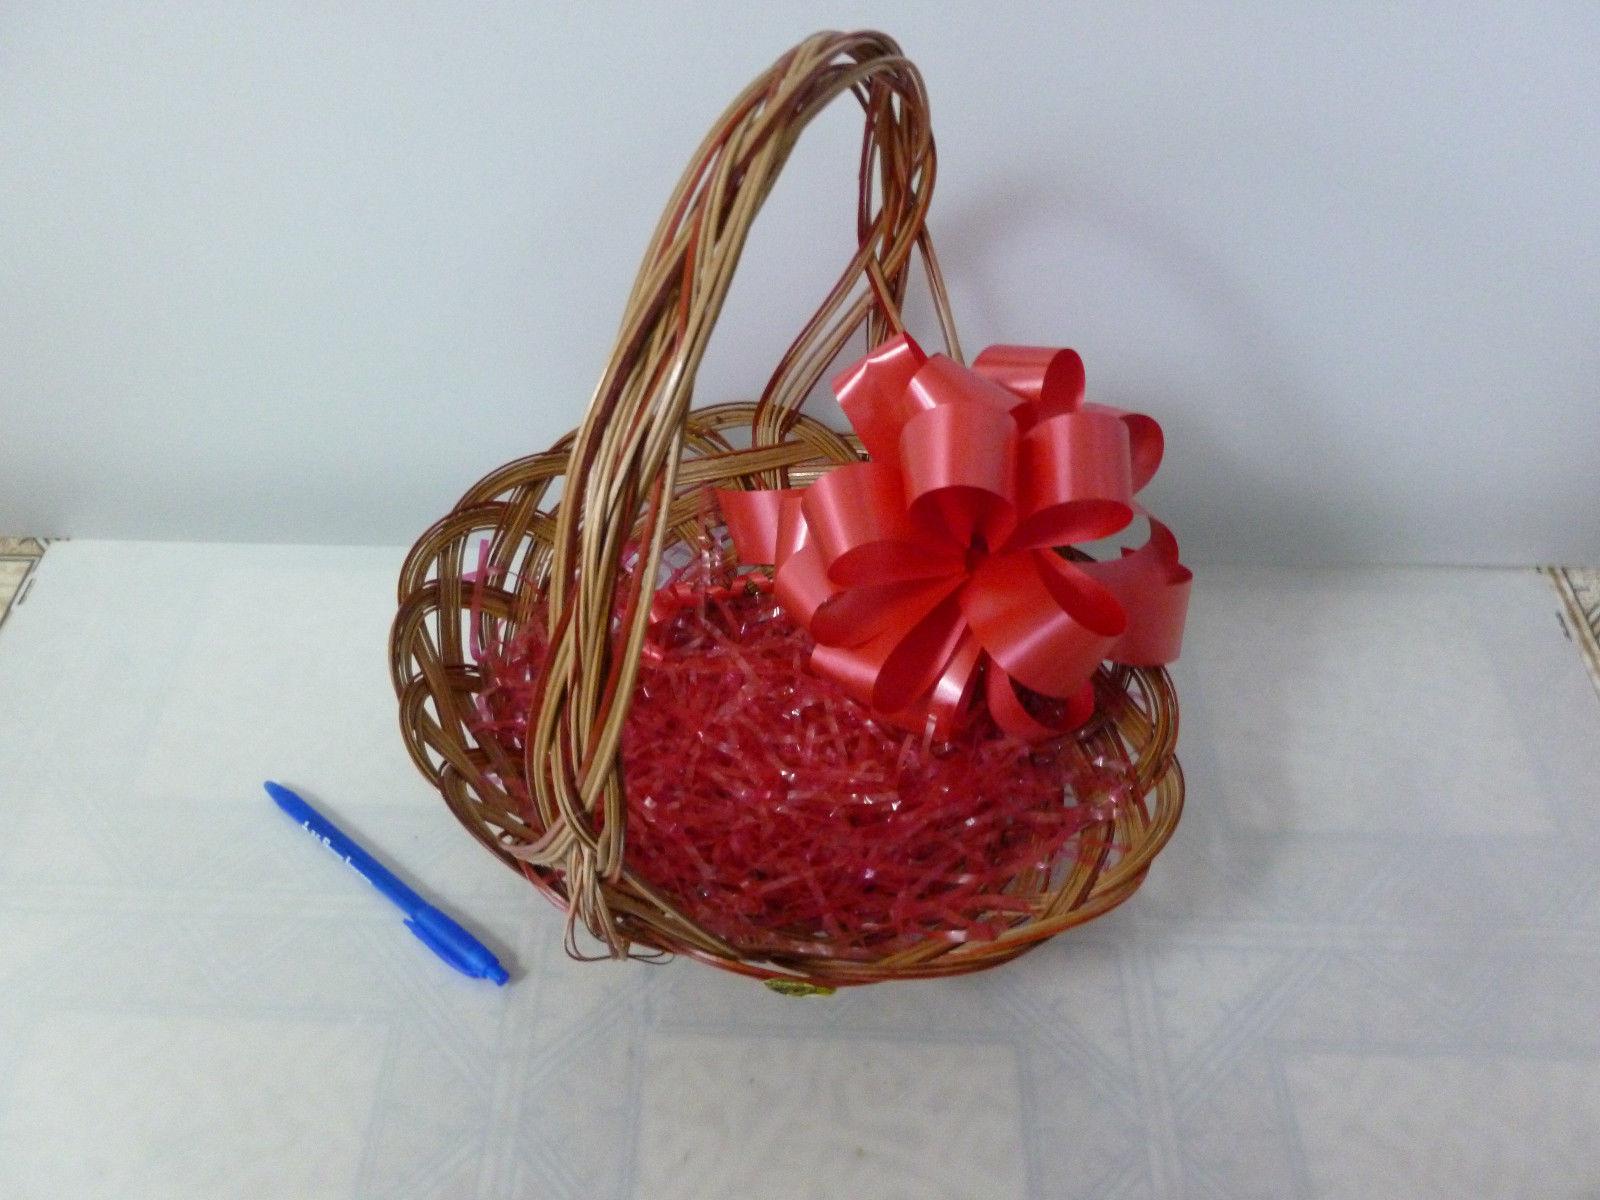 Empty Wicker Picnic Hamper New born Christmas Gift Hampers Shop Retail Display